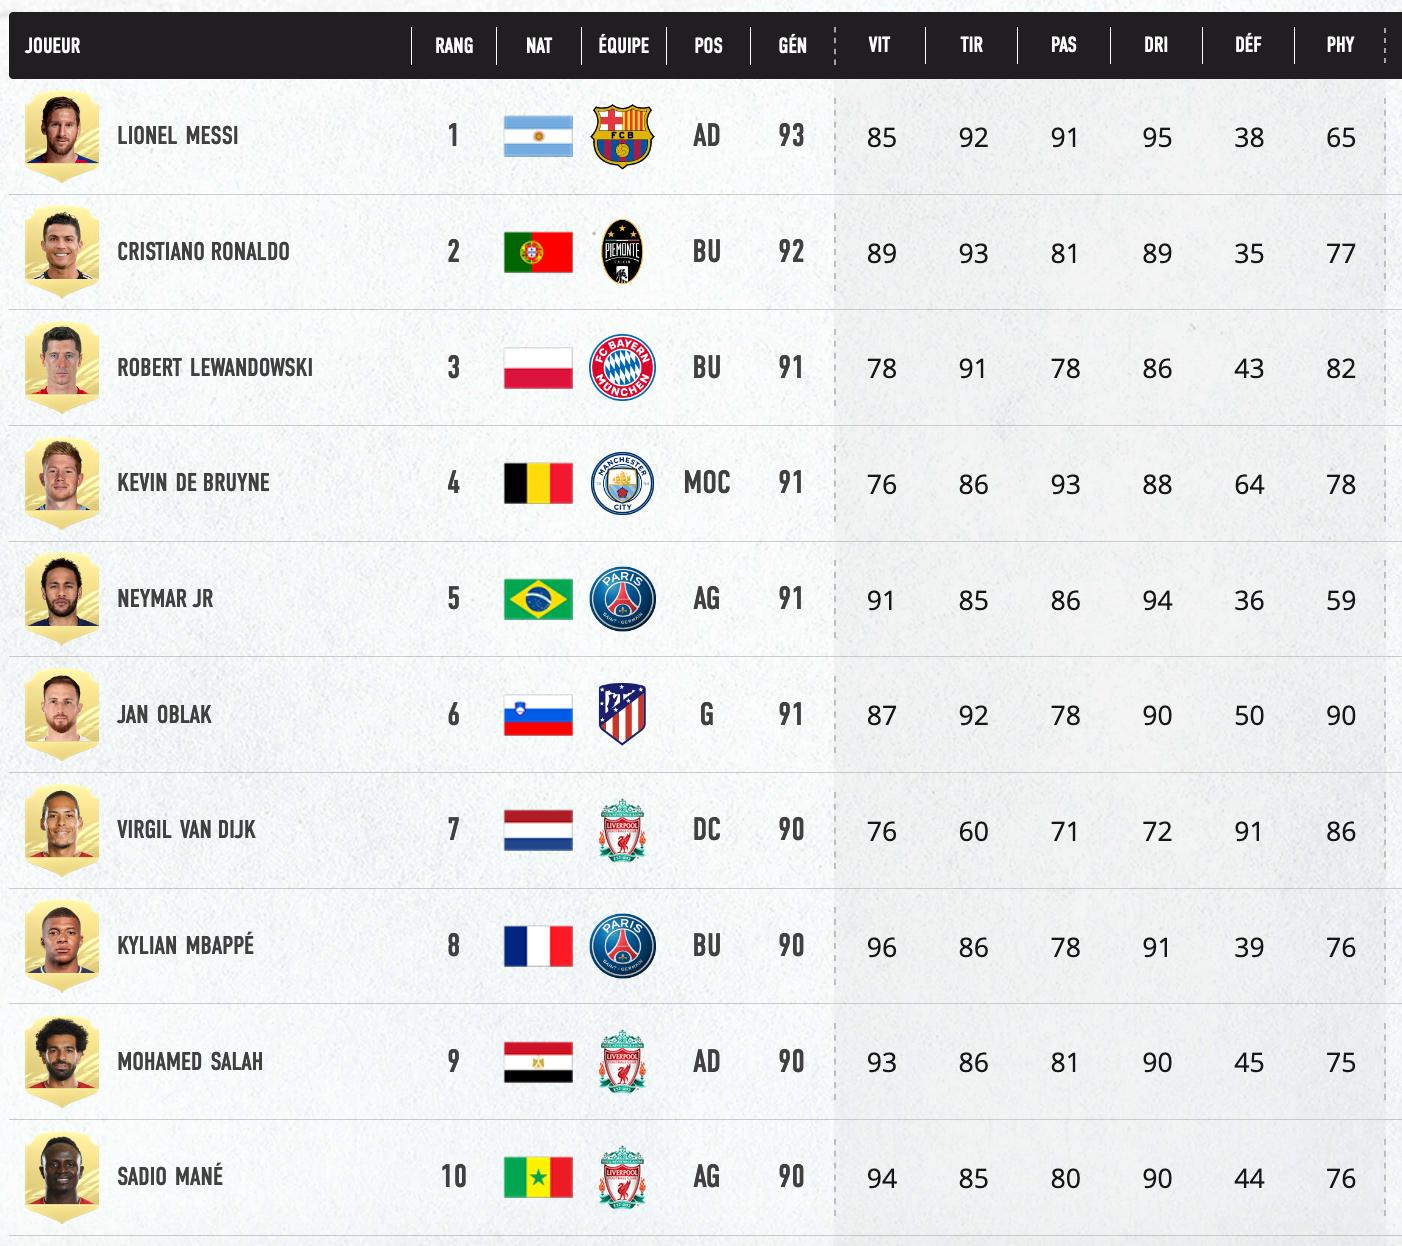 FIFA 21 TOP 10 MEILLEURS JOUEURS